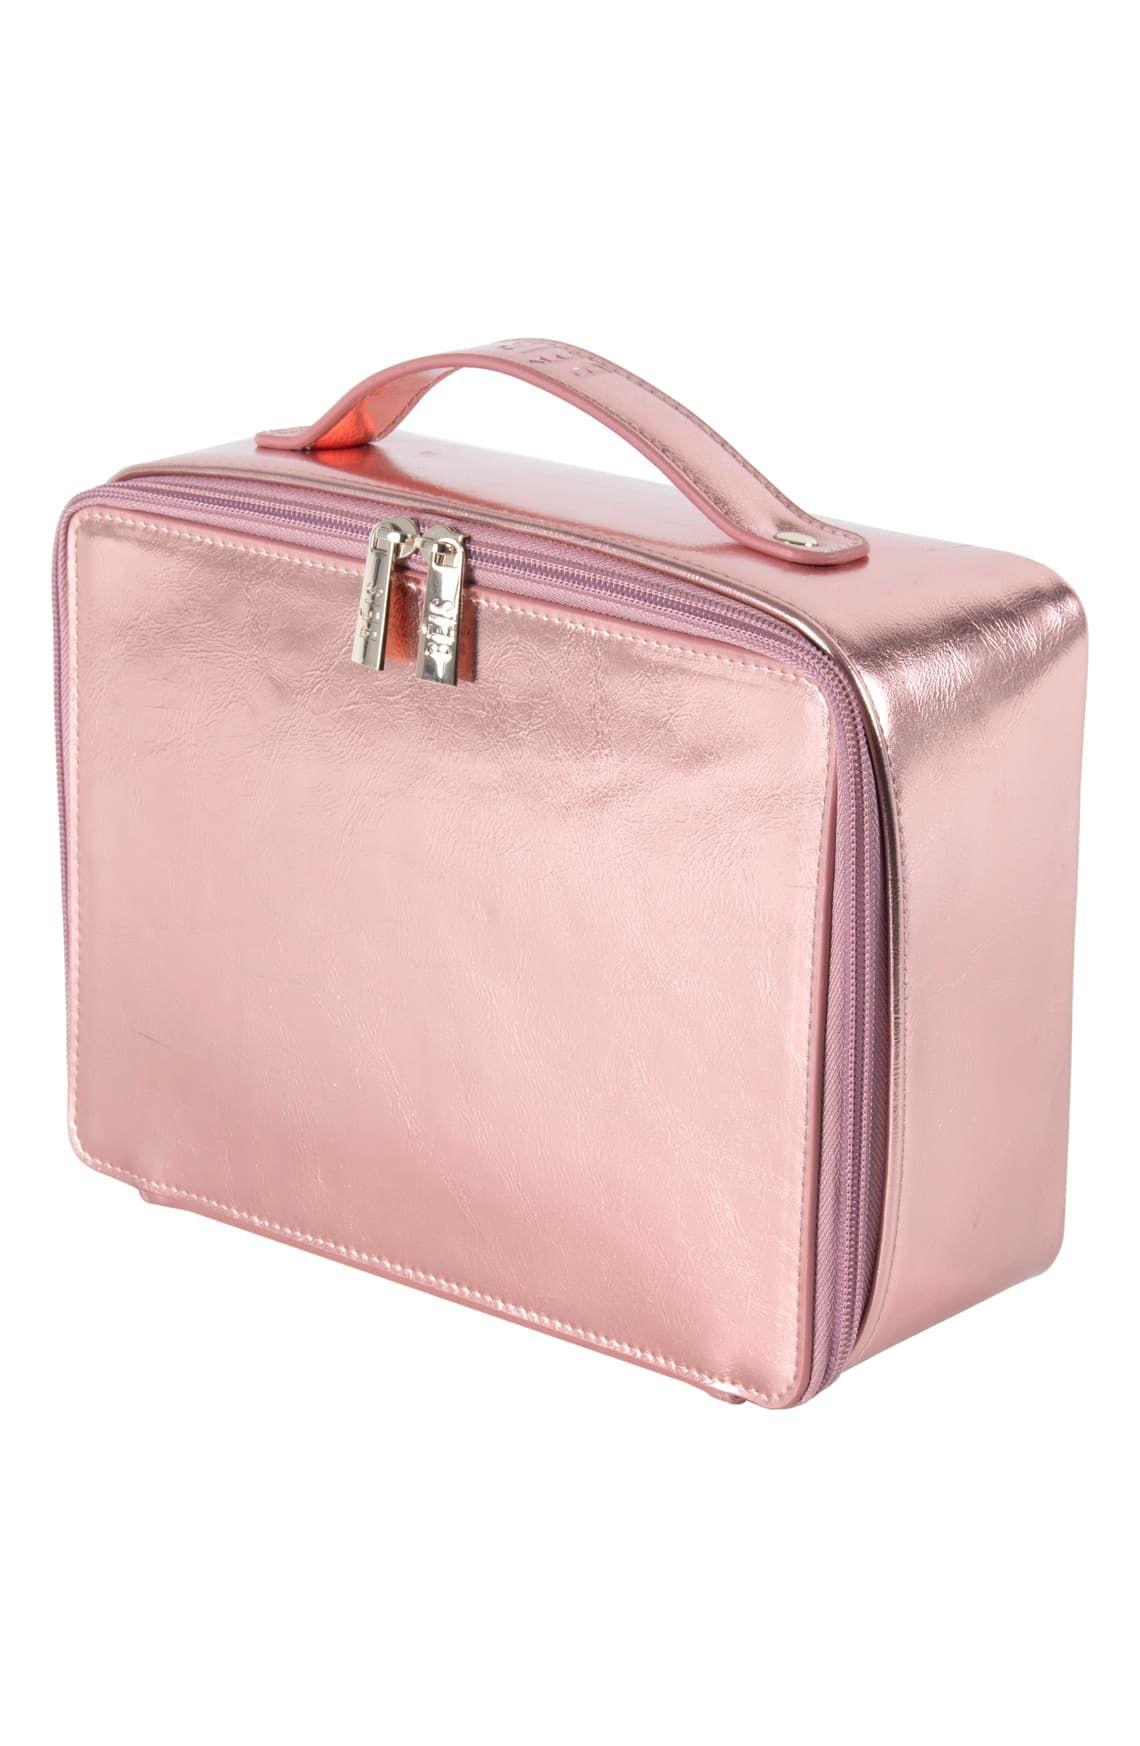 Béis Travel Cosmetics Case Nordstrom Cosmetic case